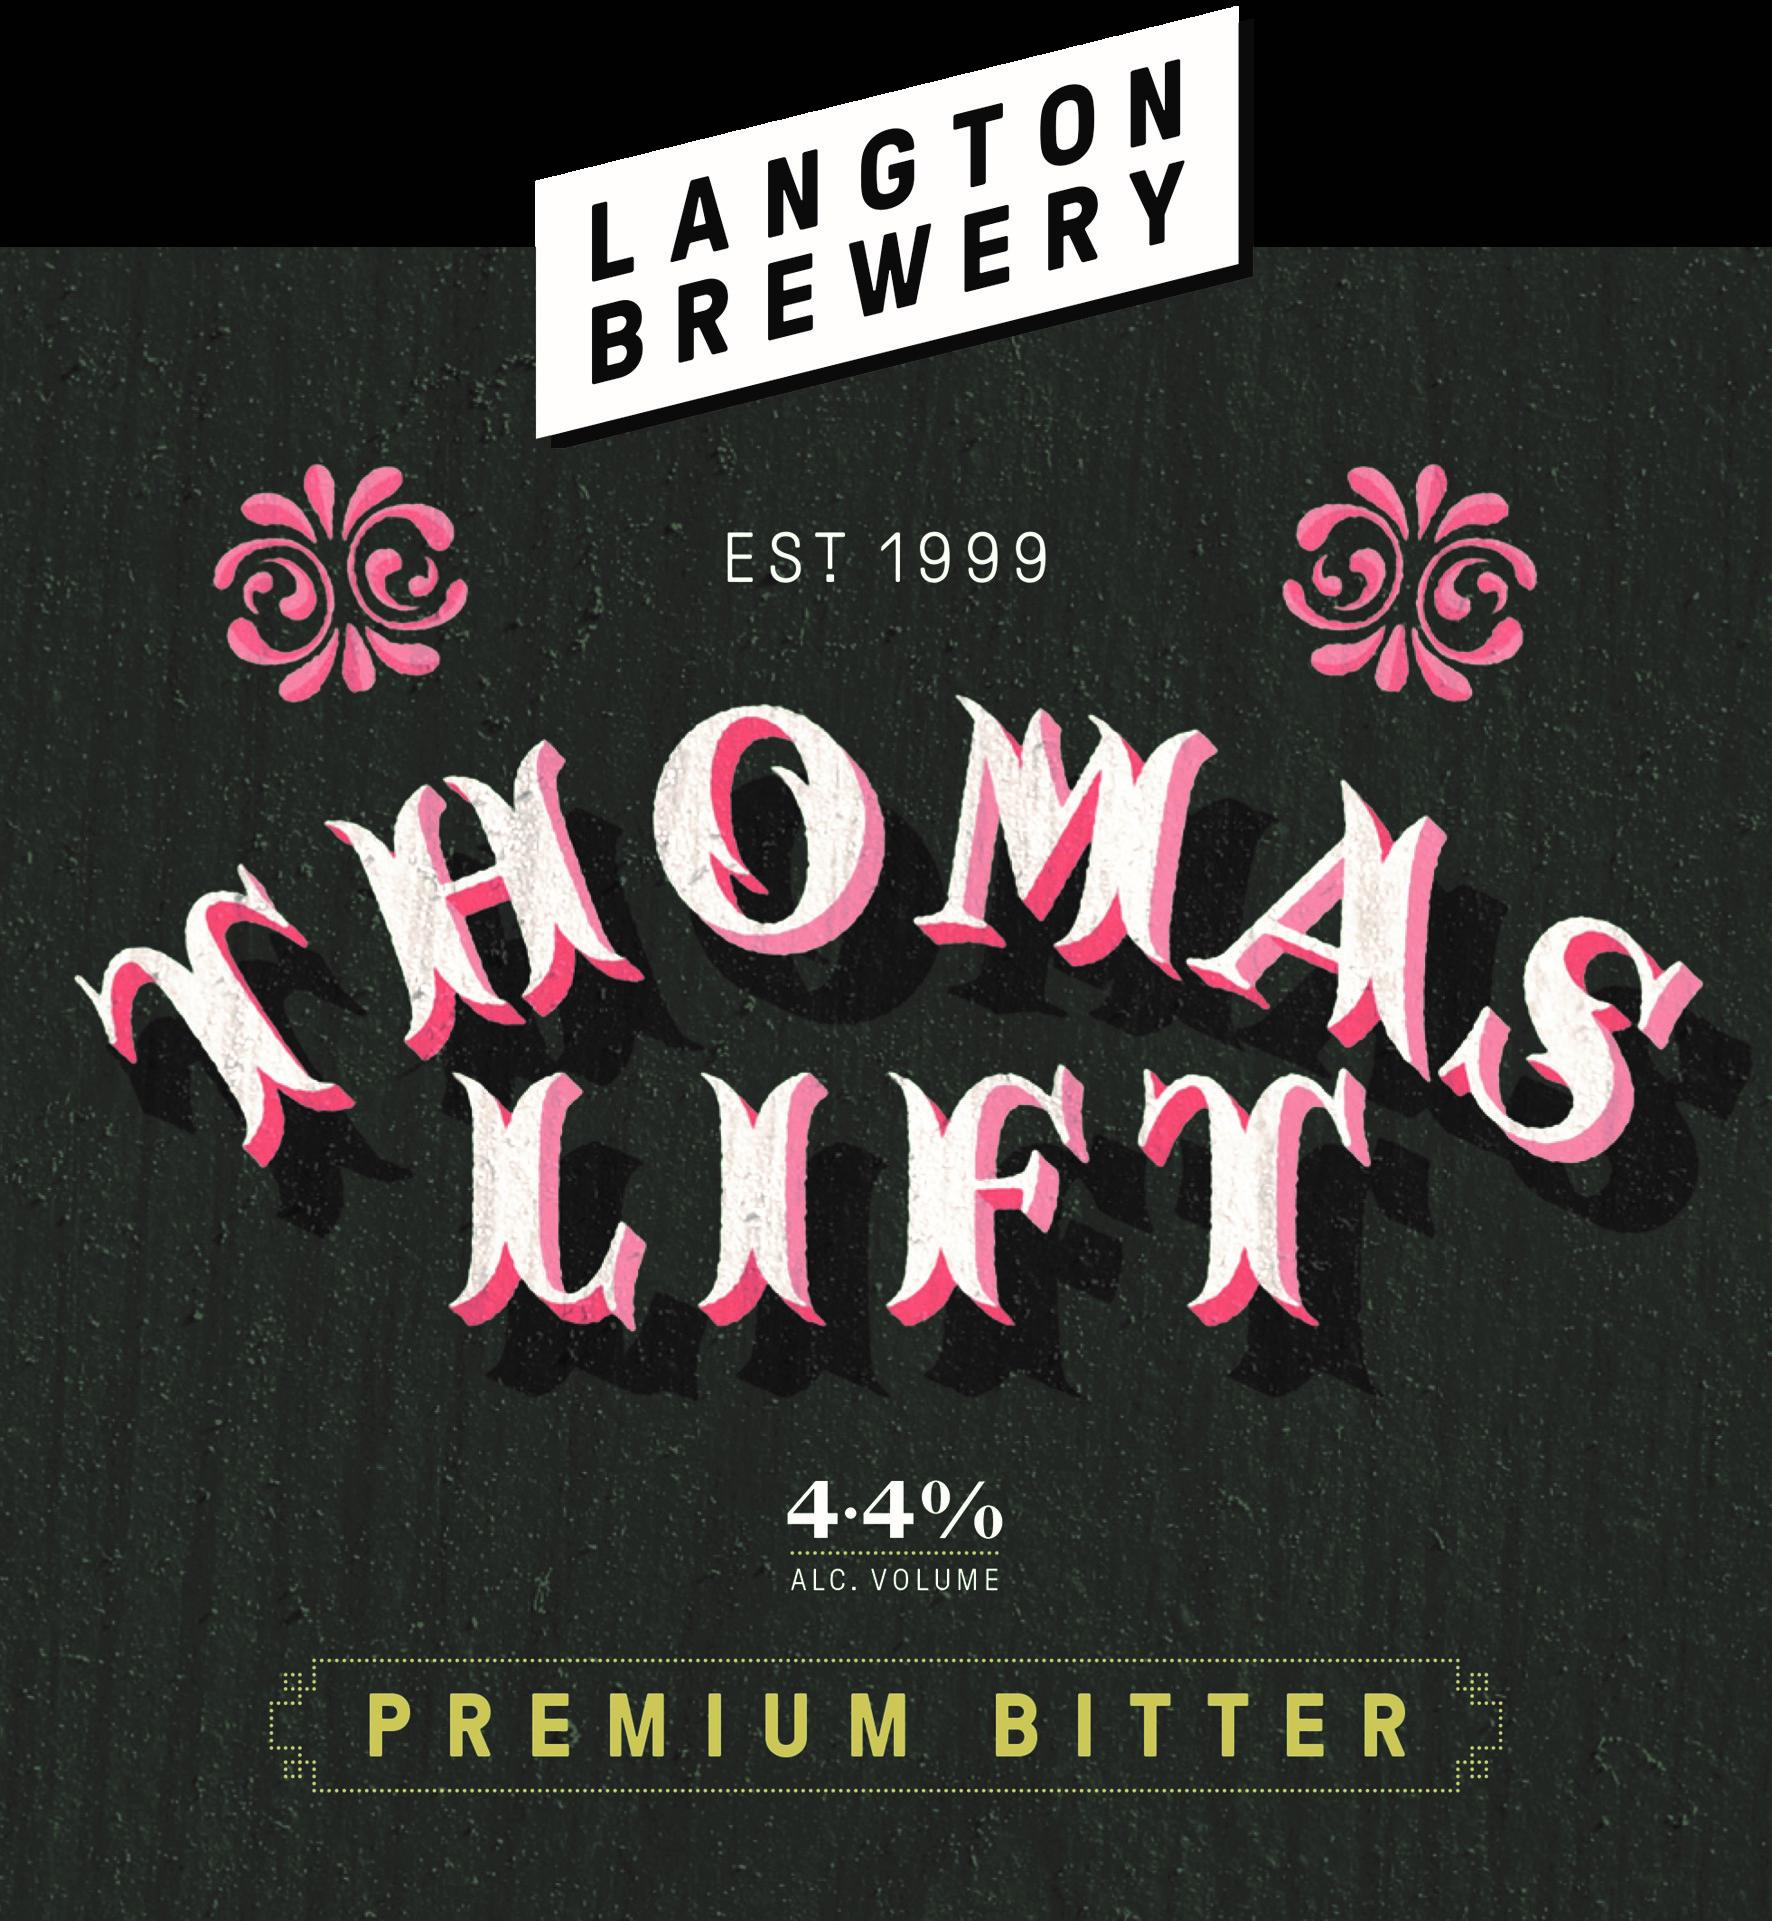 Langton Thomas Lift 9 Gallons Chestnut 4.4%